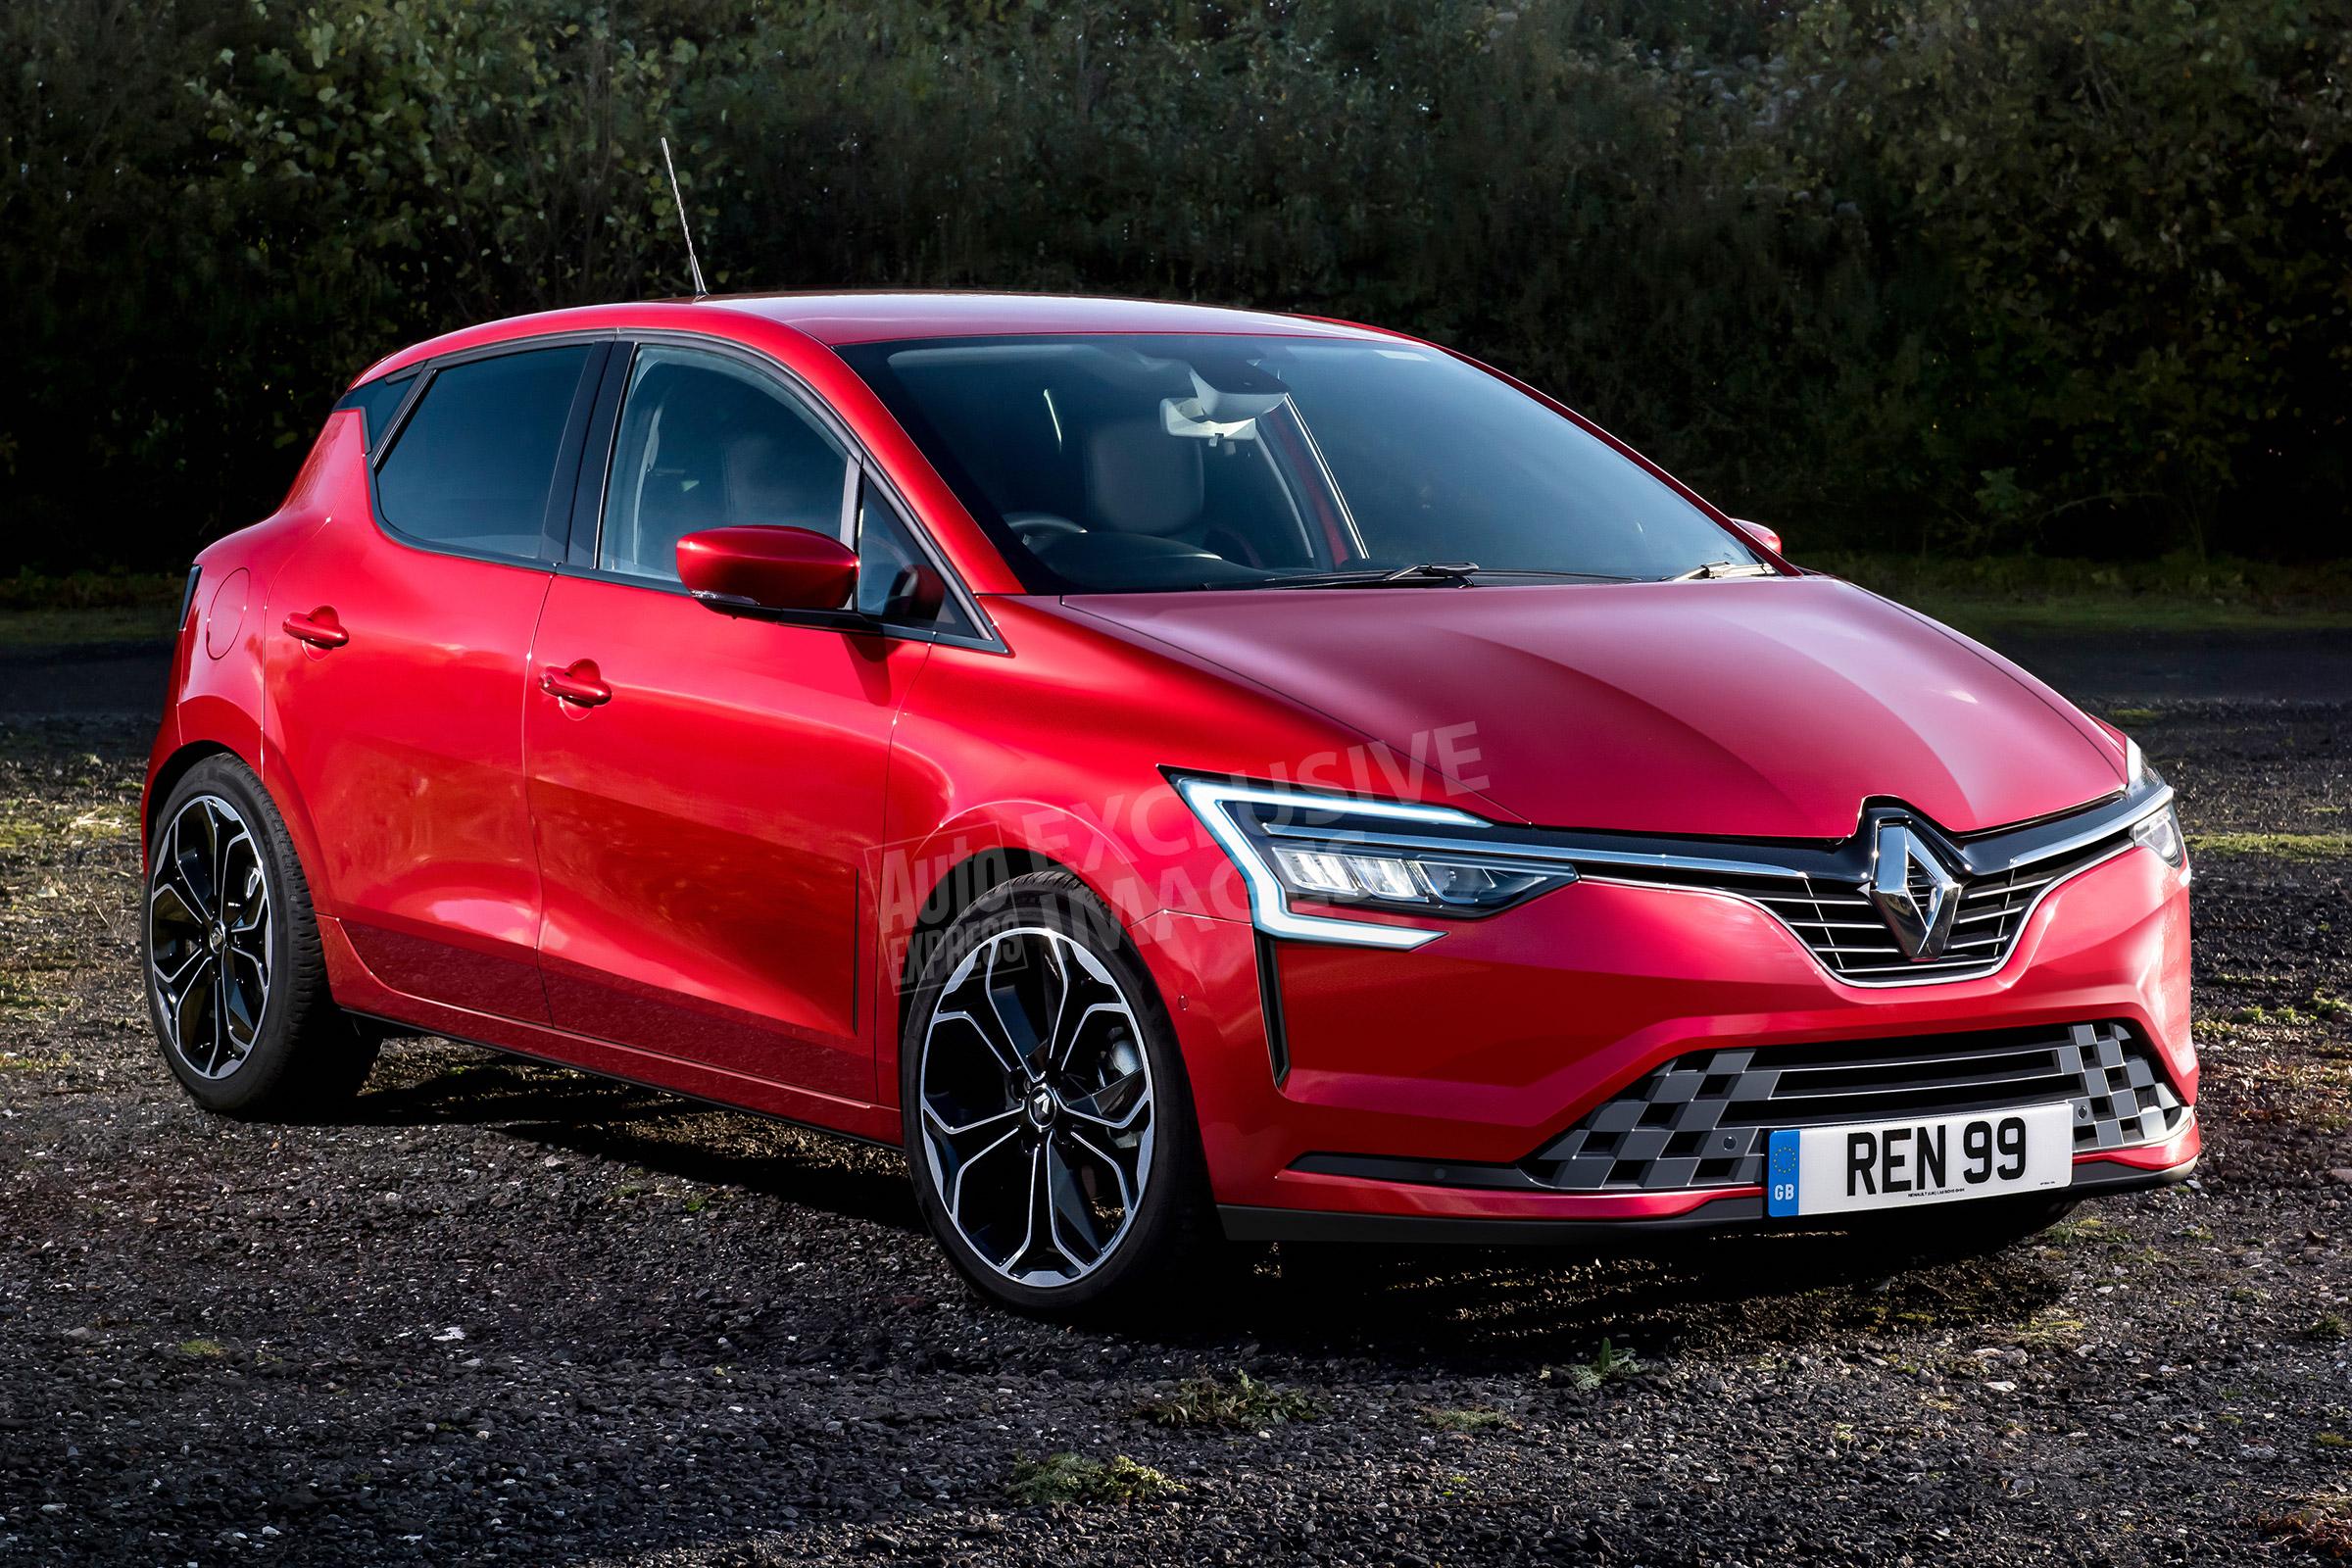 Renault Clio 2019 – prve informacije i fotografije